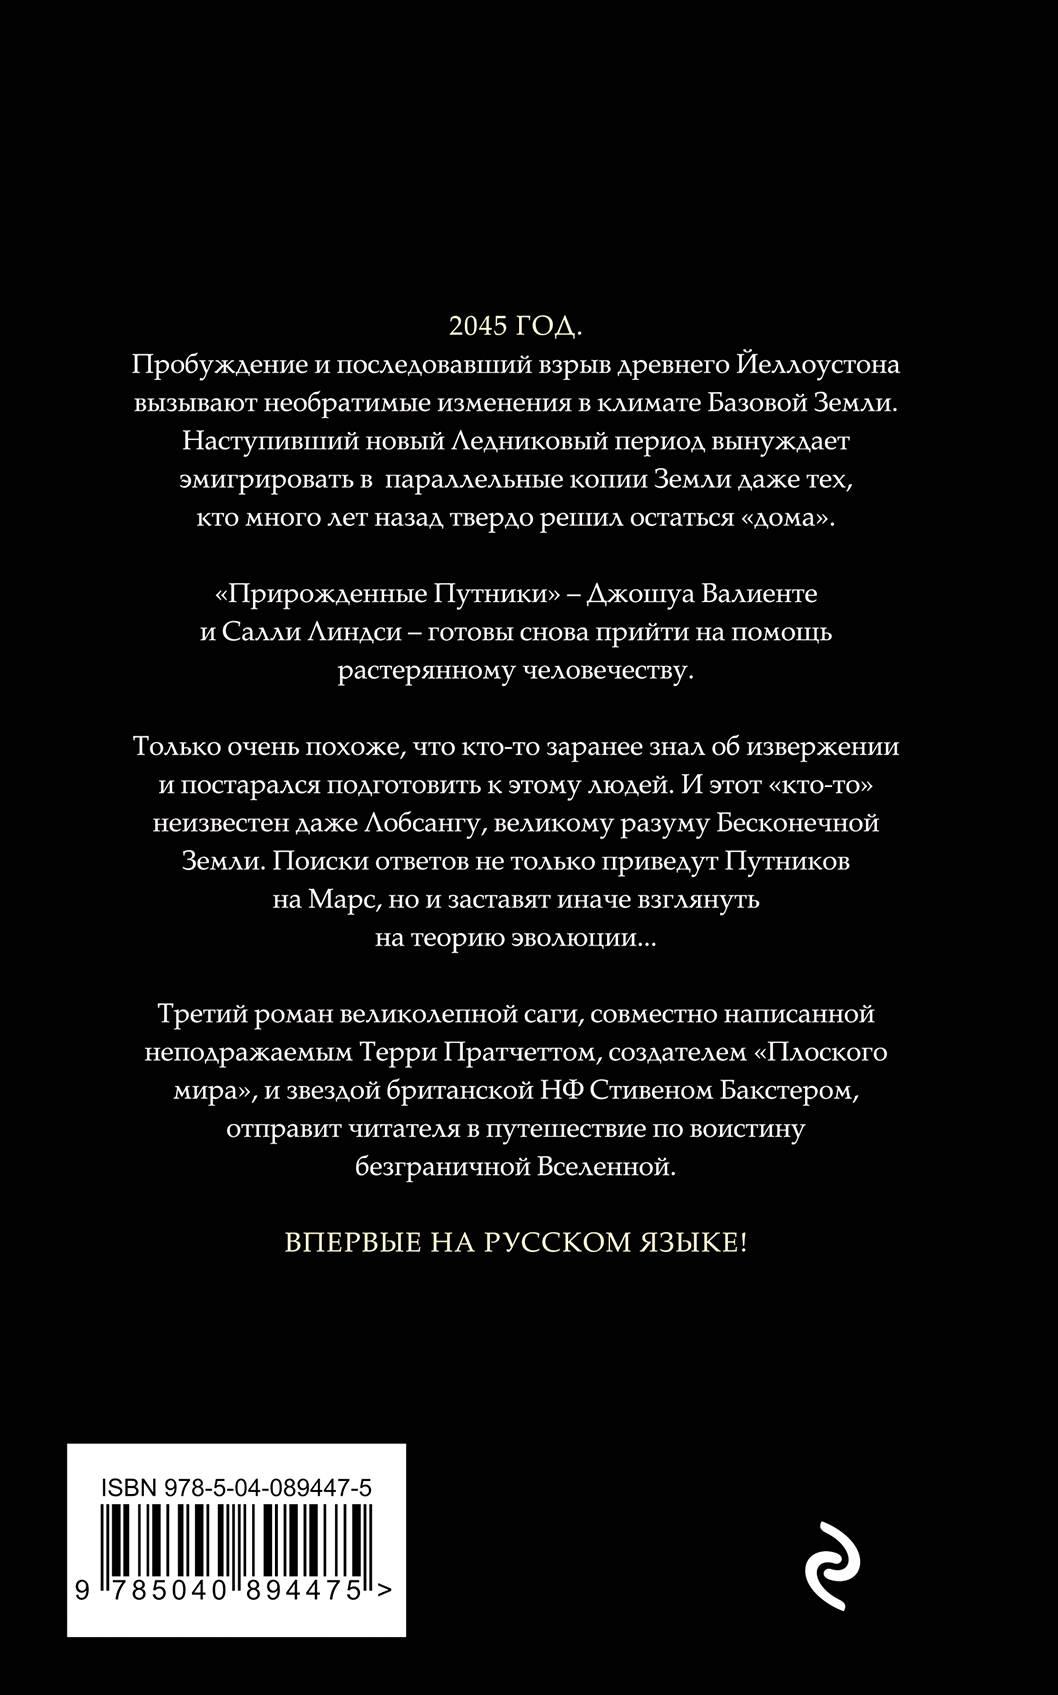 Бесконечный Марс. Терри Пратчетт, Стивен Бакстер